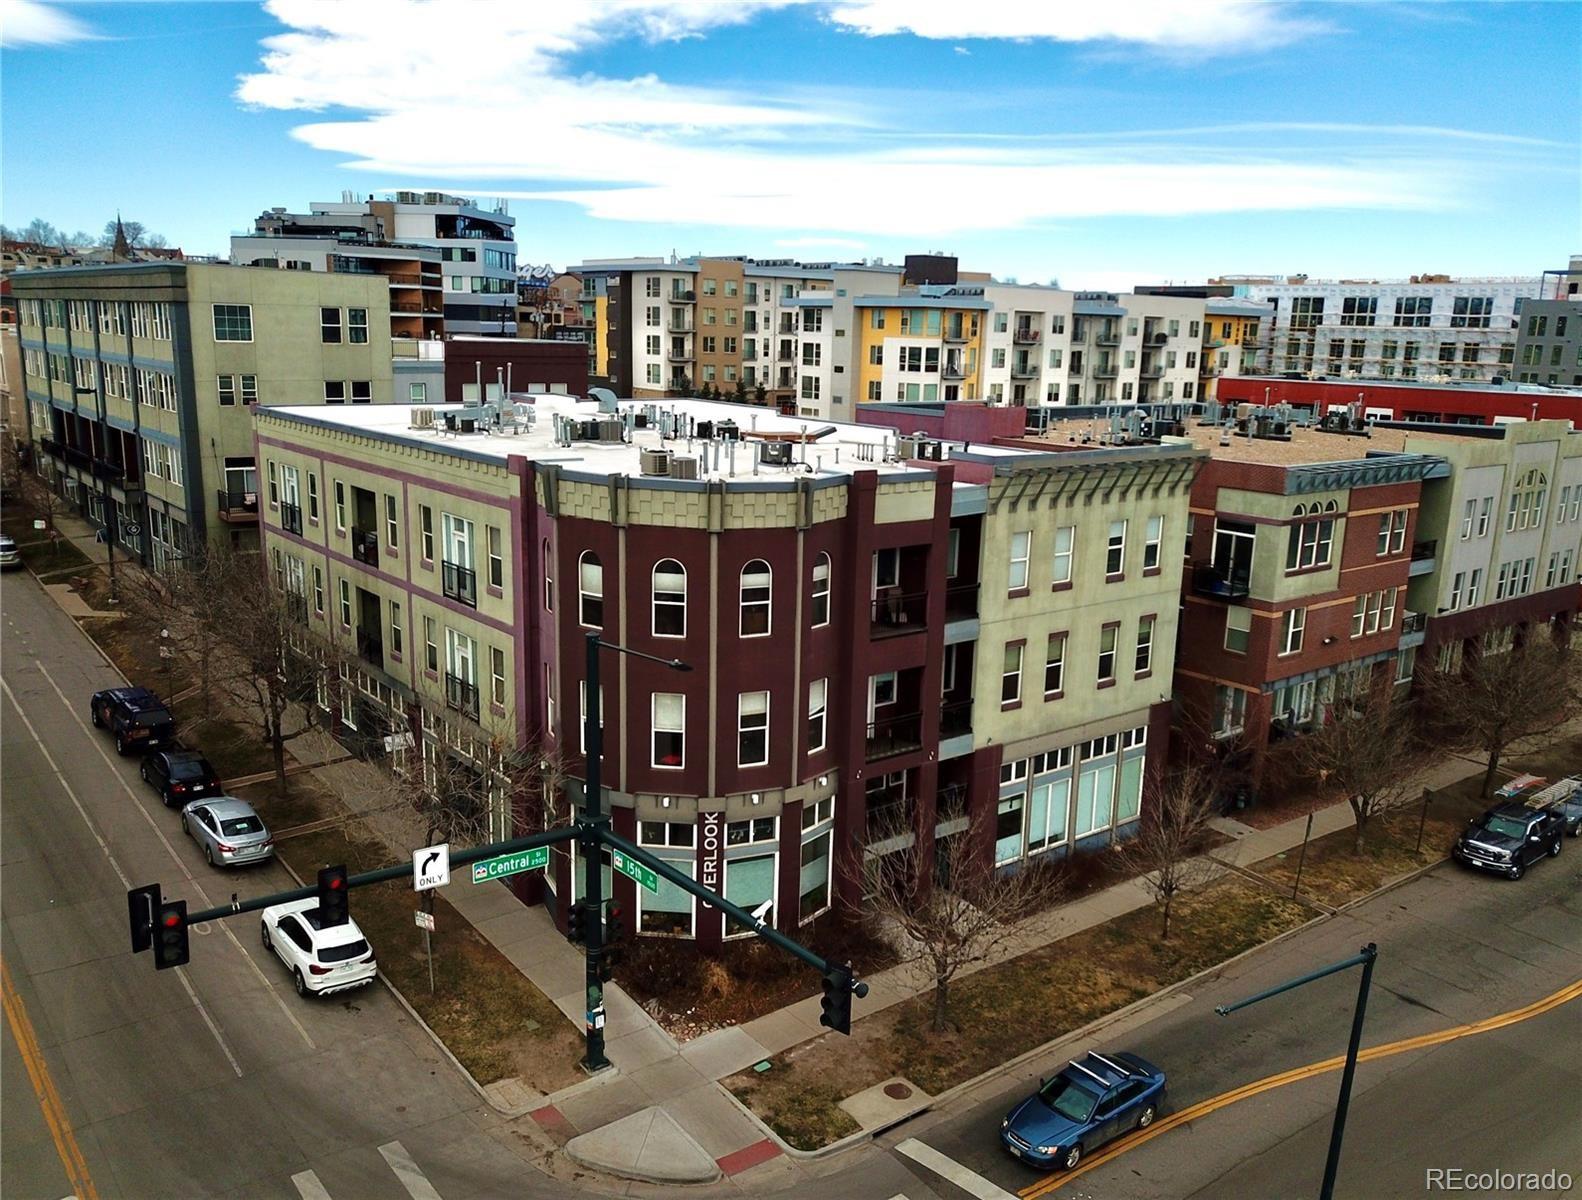 MLS# 5534016 - 1 - 2501 15th Street #2F, Denver, CO 80211